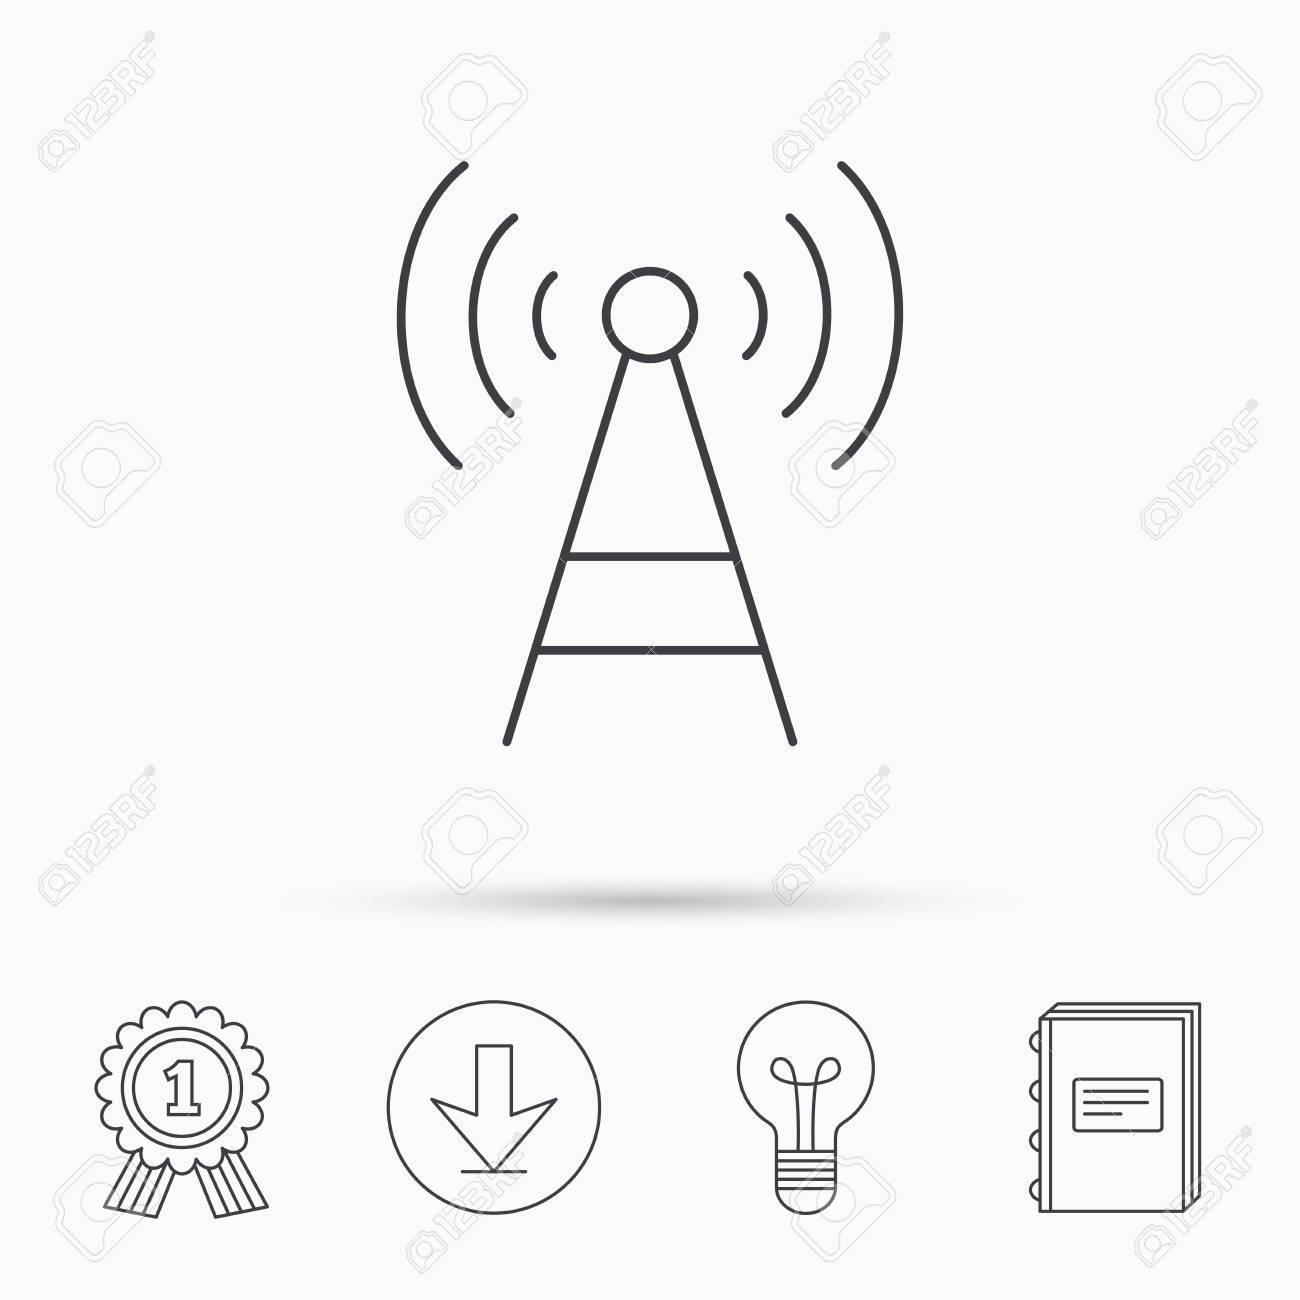 Tele munication tower icon signal sign wireless wifi work